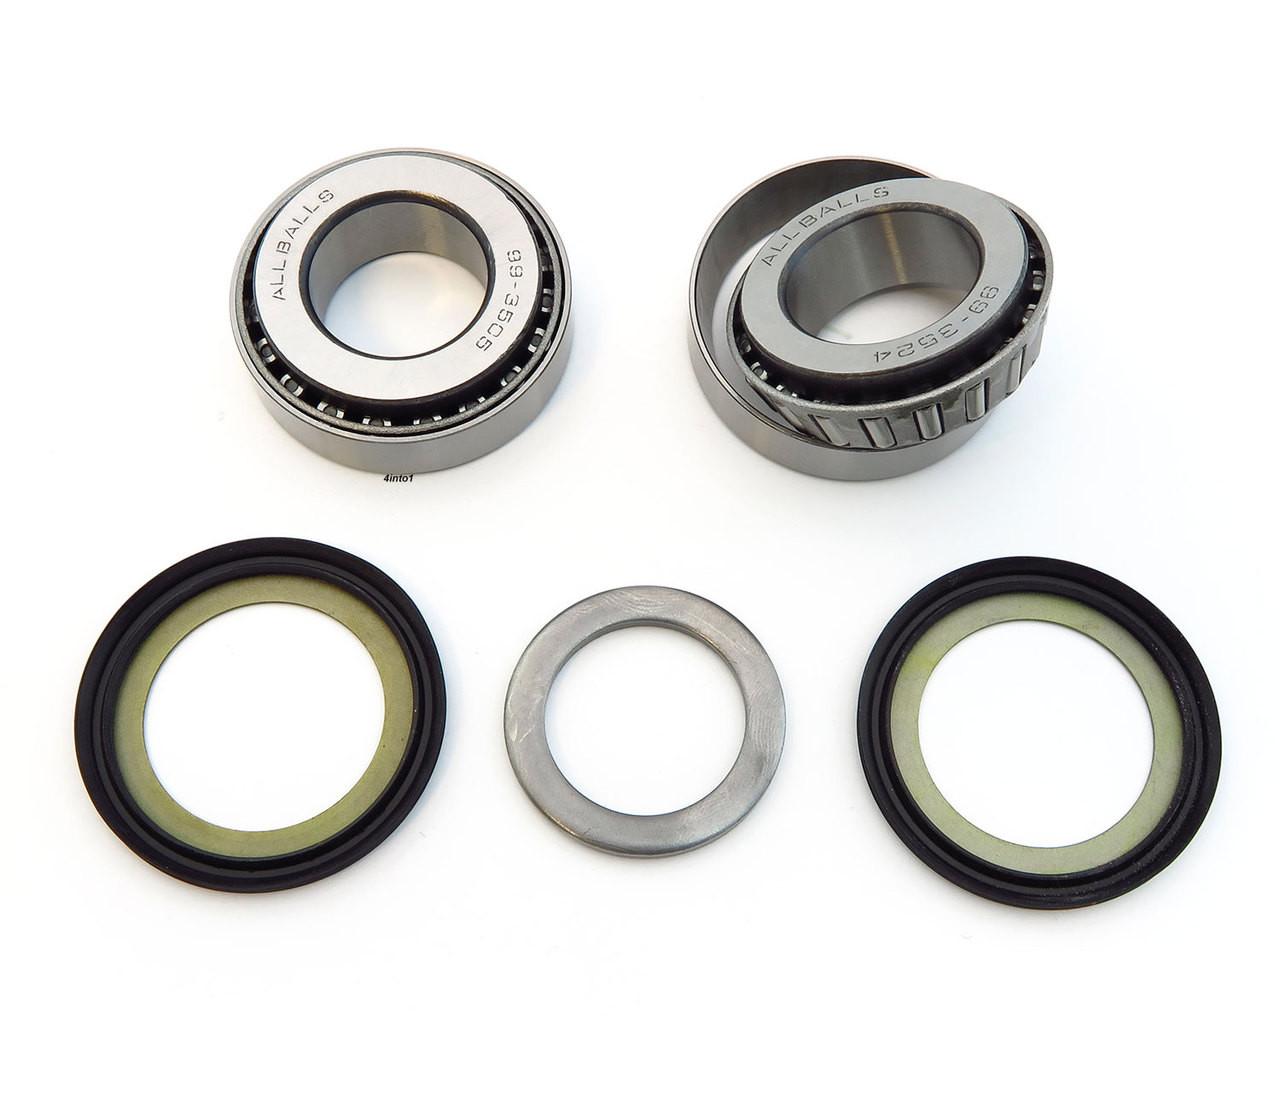 22-1066 Honda SL175 SL 175 1970-1971 Steering Head Stem Bearing /& Seal Kit